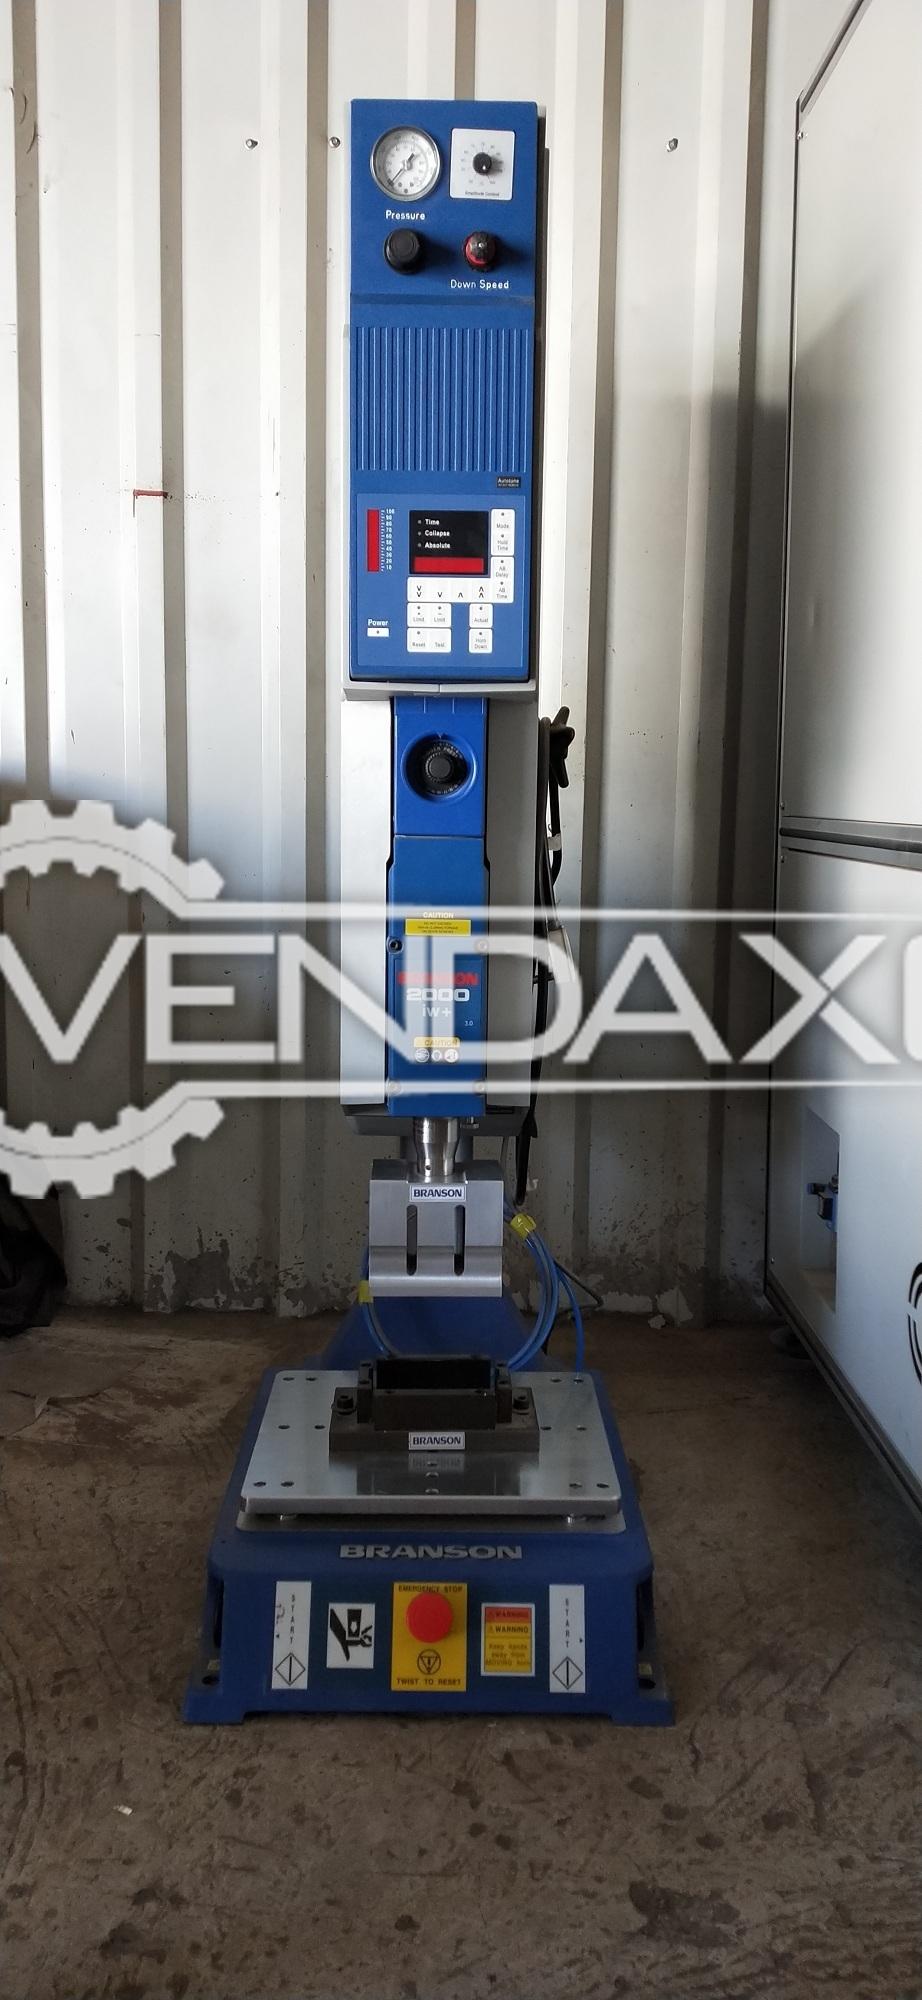 Branson 2000 IW+ Ultrasonic Plastic part Sealing(welding) Machine - Power - 22 KW